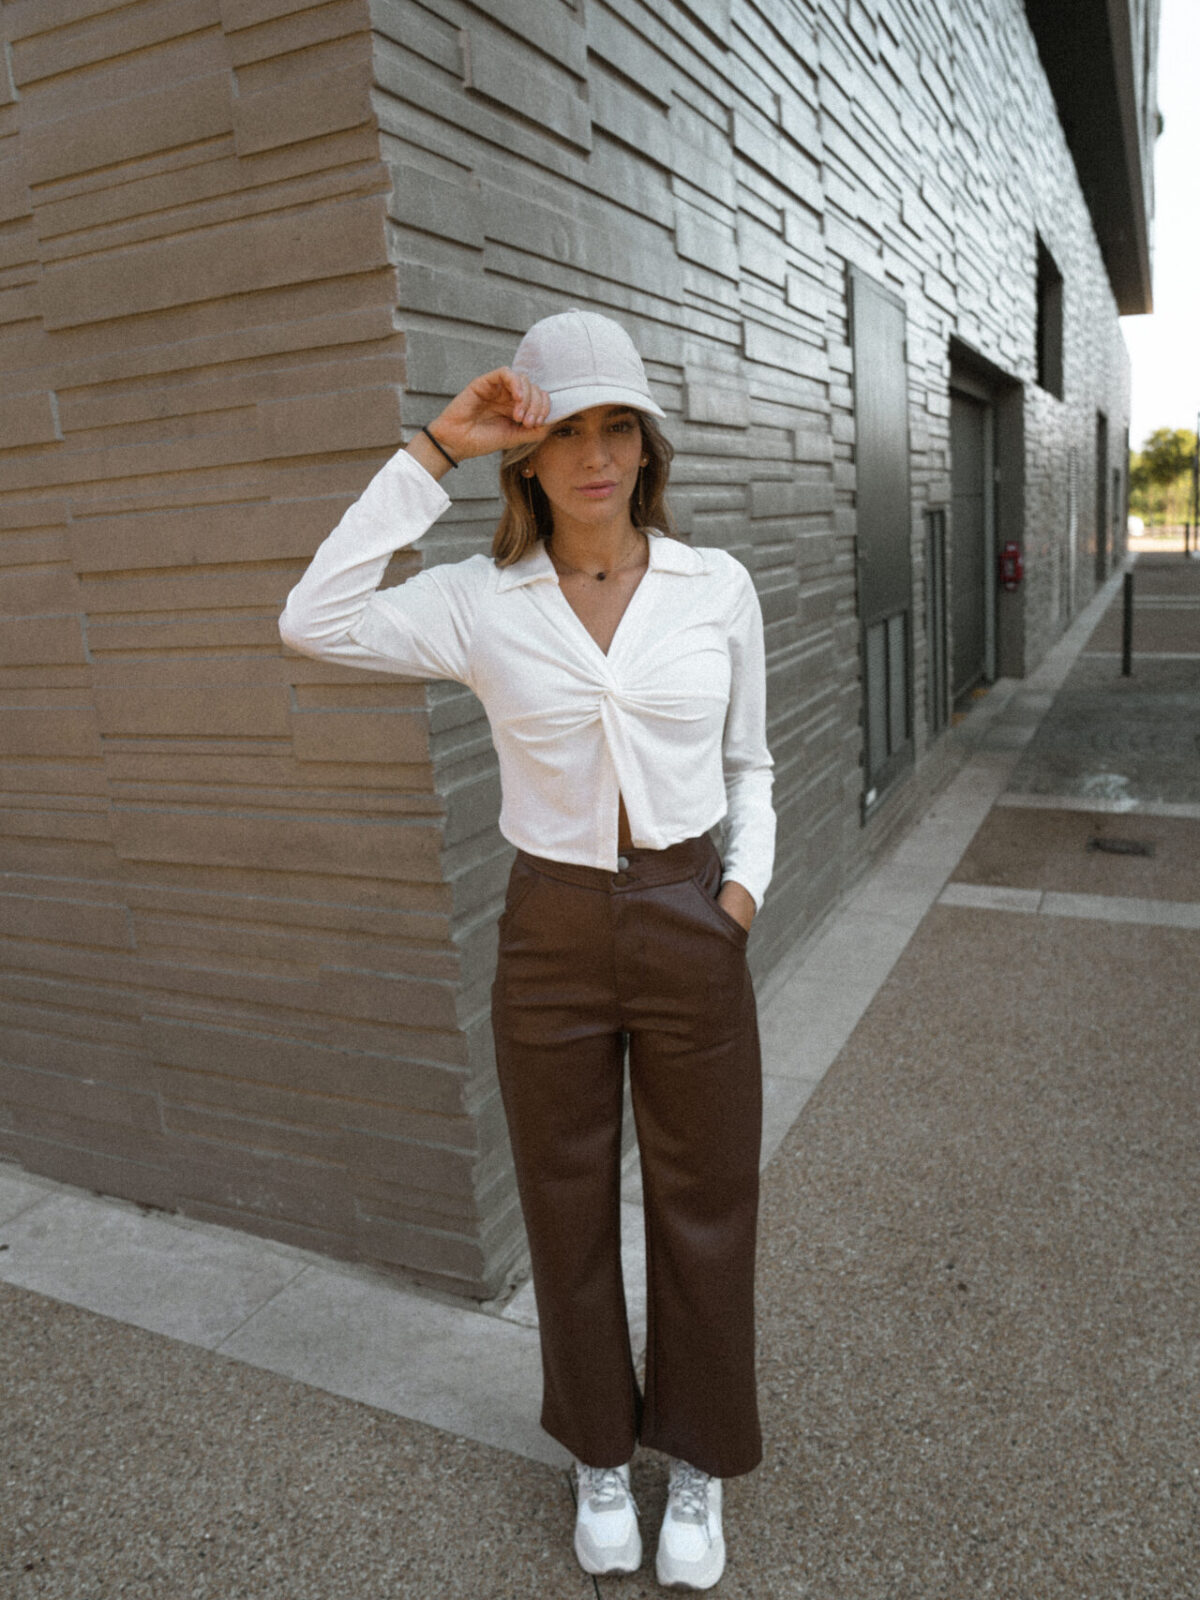 top-chemise-blanc-casquette-pantalon-simili-marron-femme-gisette-store (12)